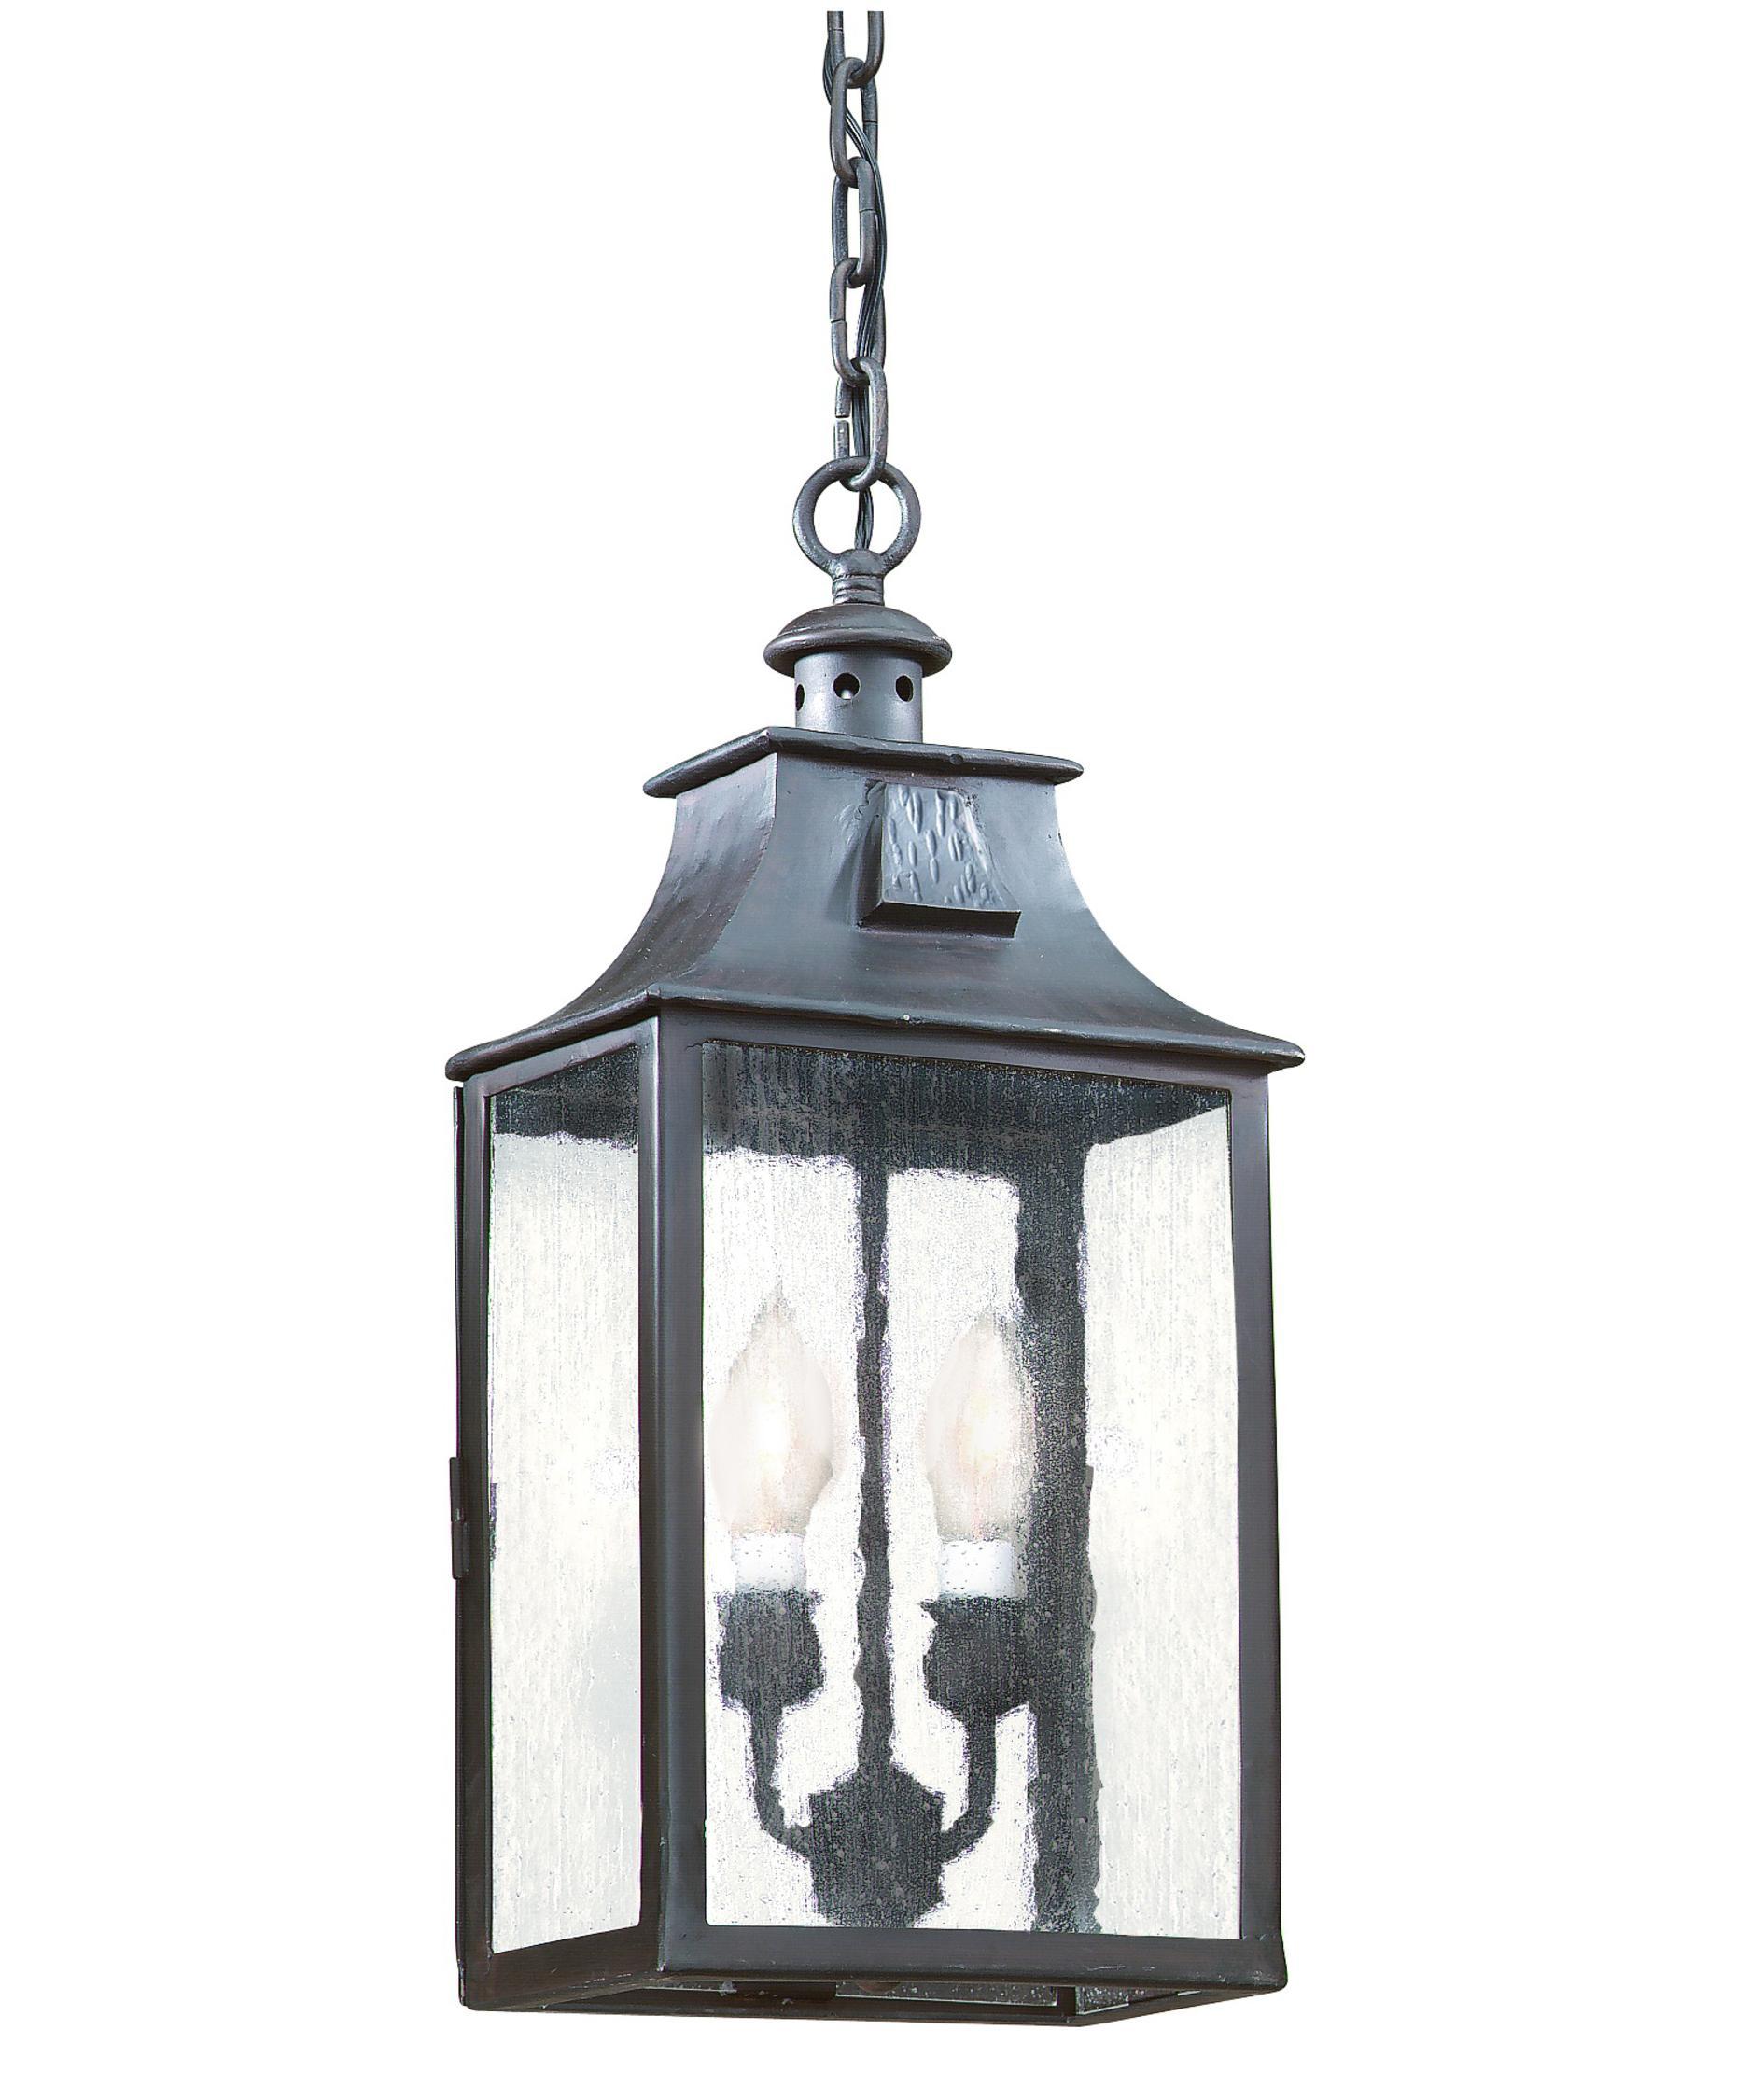 Outdoor hanging lighting - Troy Lighting F9004 Newton 9 Inch Wide 2 Light Outdoor Hanging Lantern Capitol Lighting 1 800lighting Com